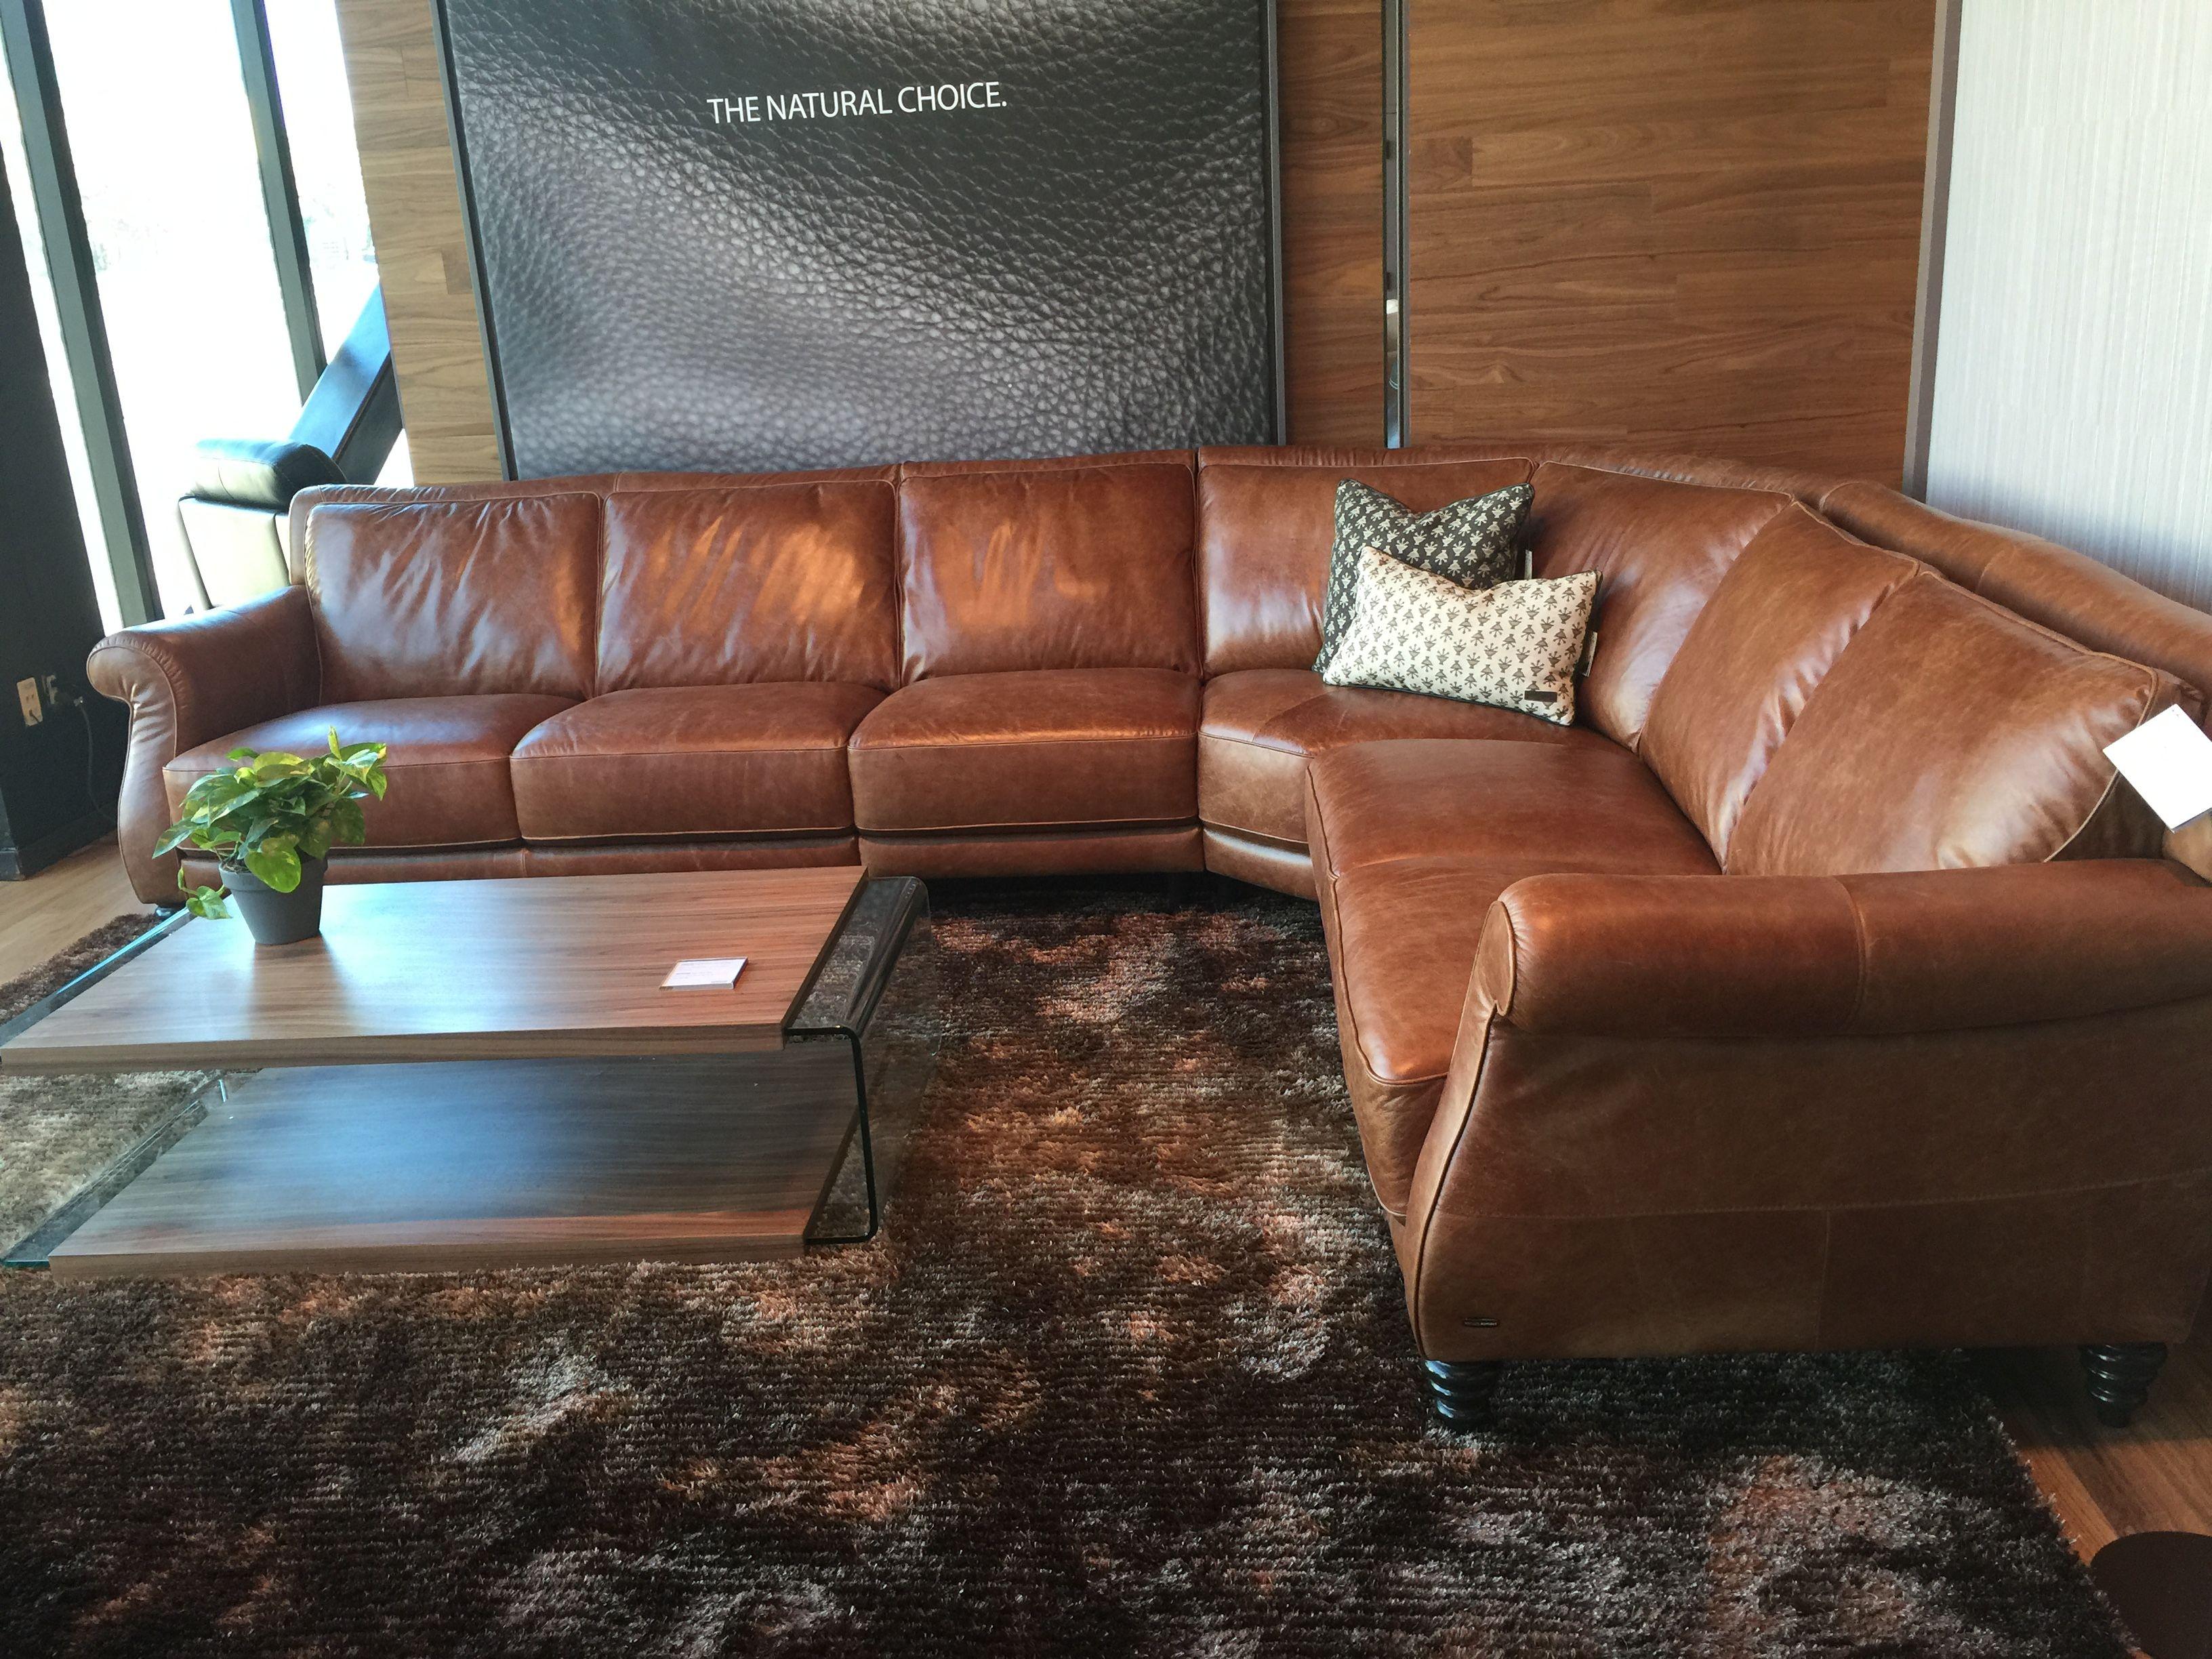 Natuzzi Editions Sectional Sofa Favorite furniture